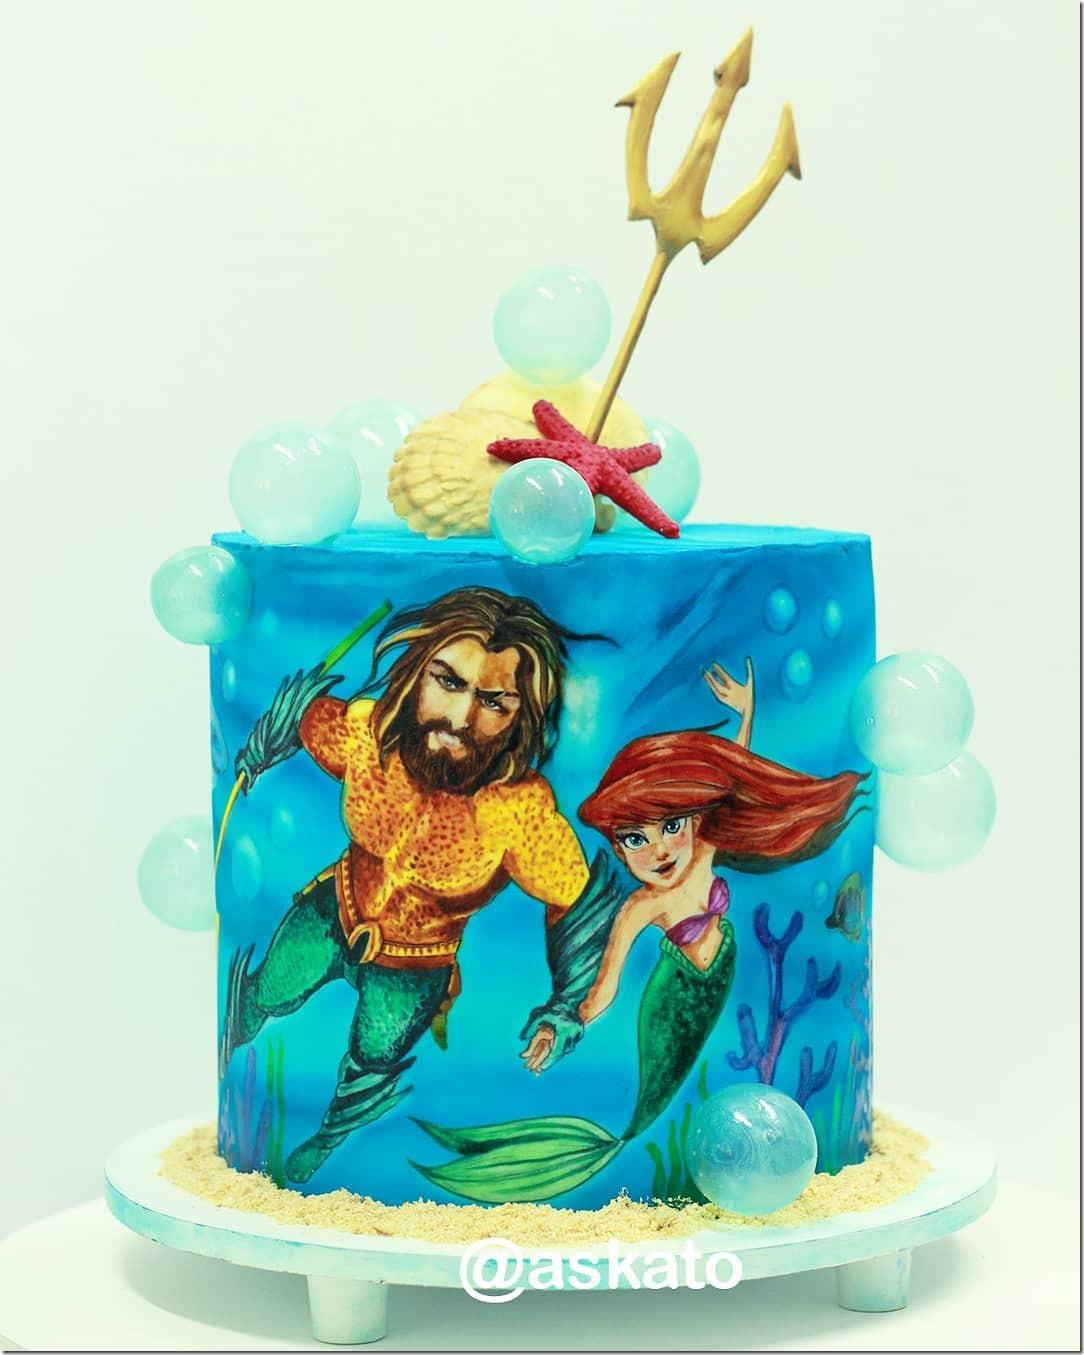 Aquaman meets The Little Mermaid Cake